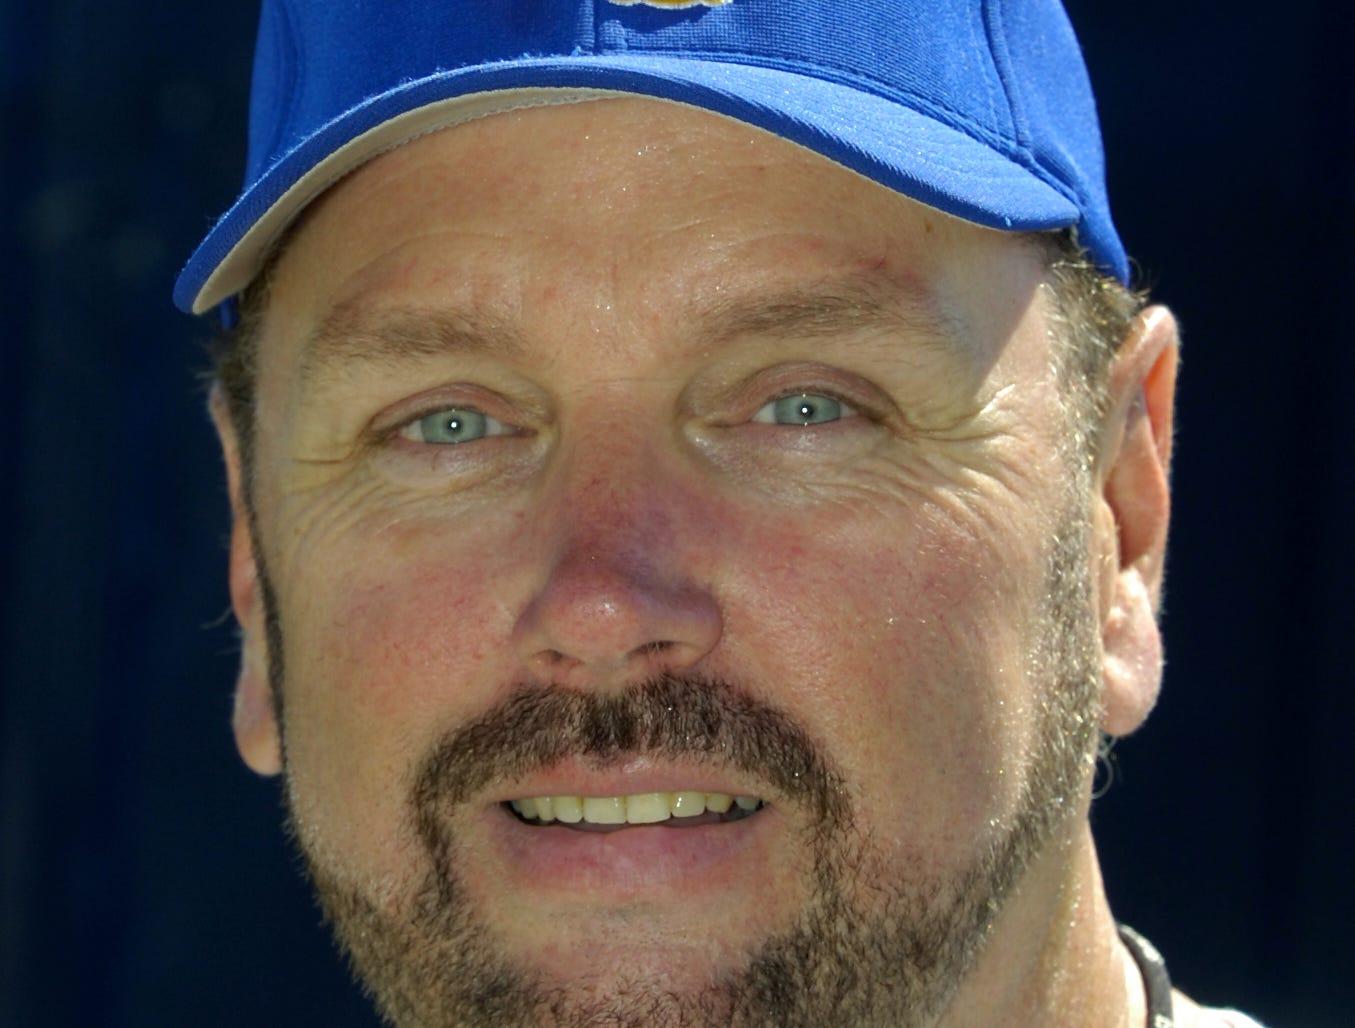 Maine-Endwell football coach Kevin Wagstaff. 2006